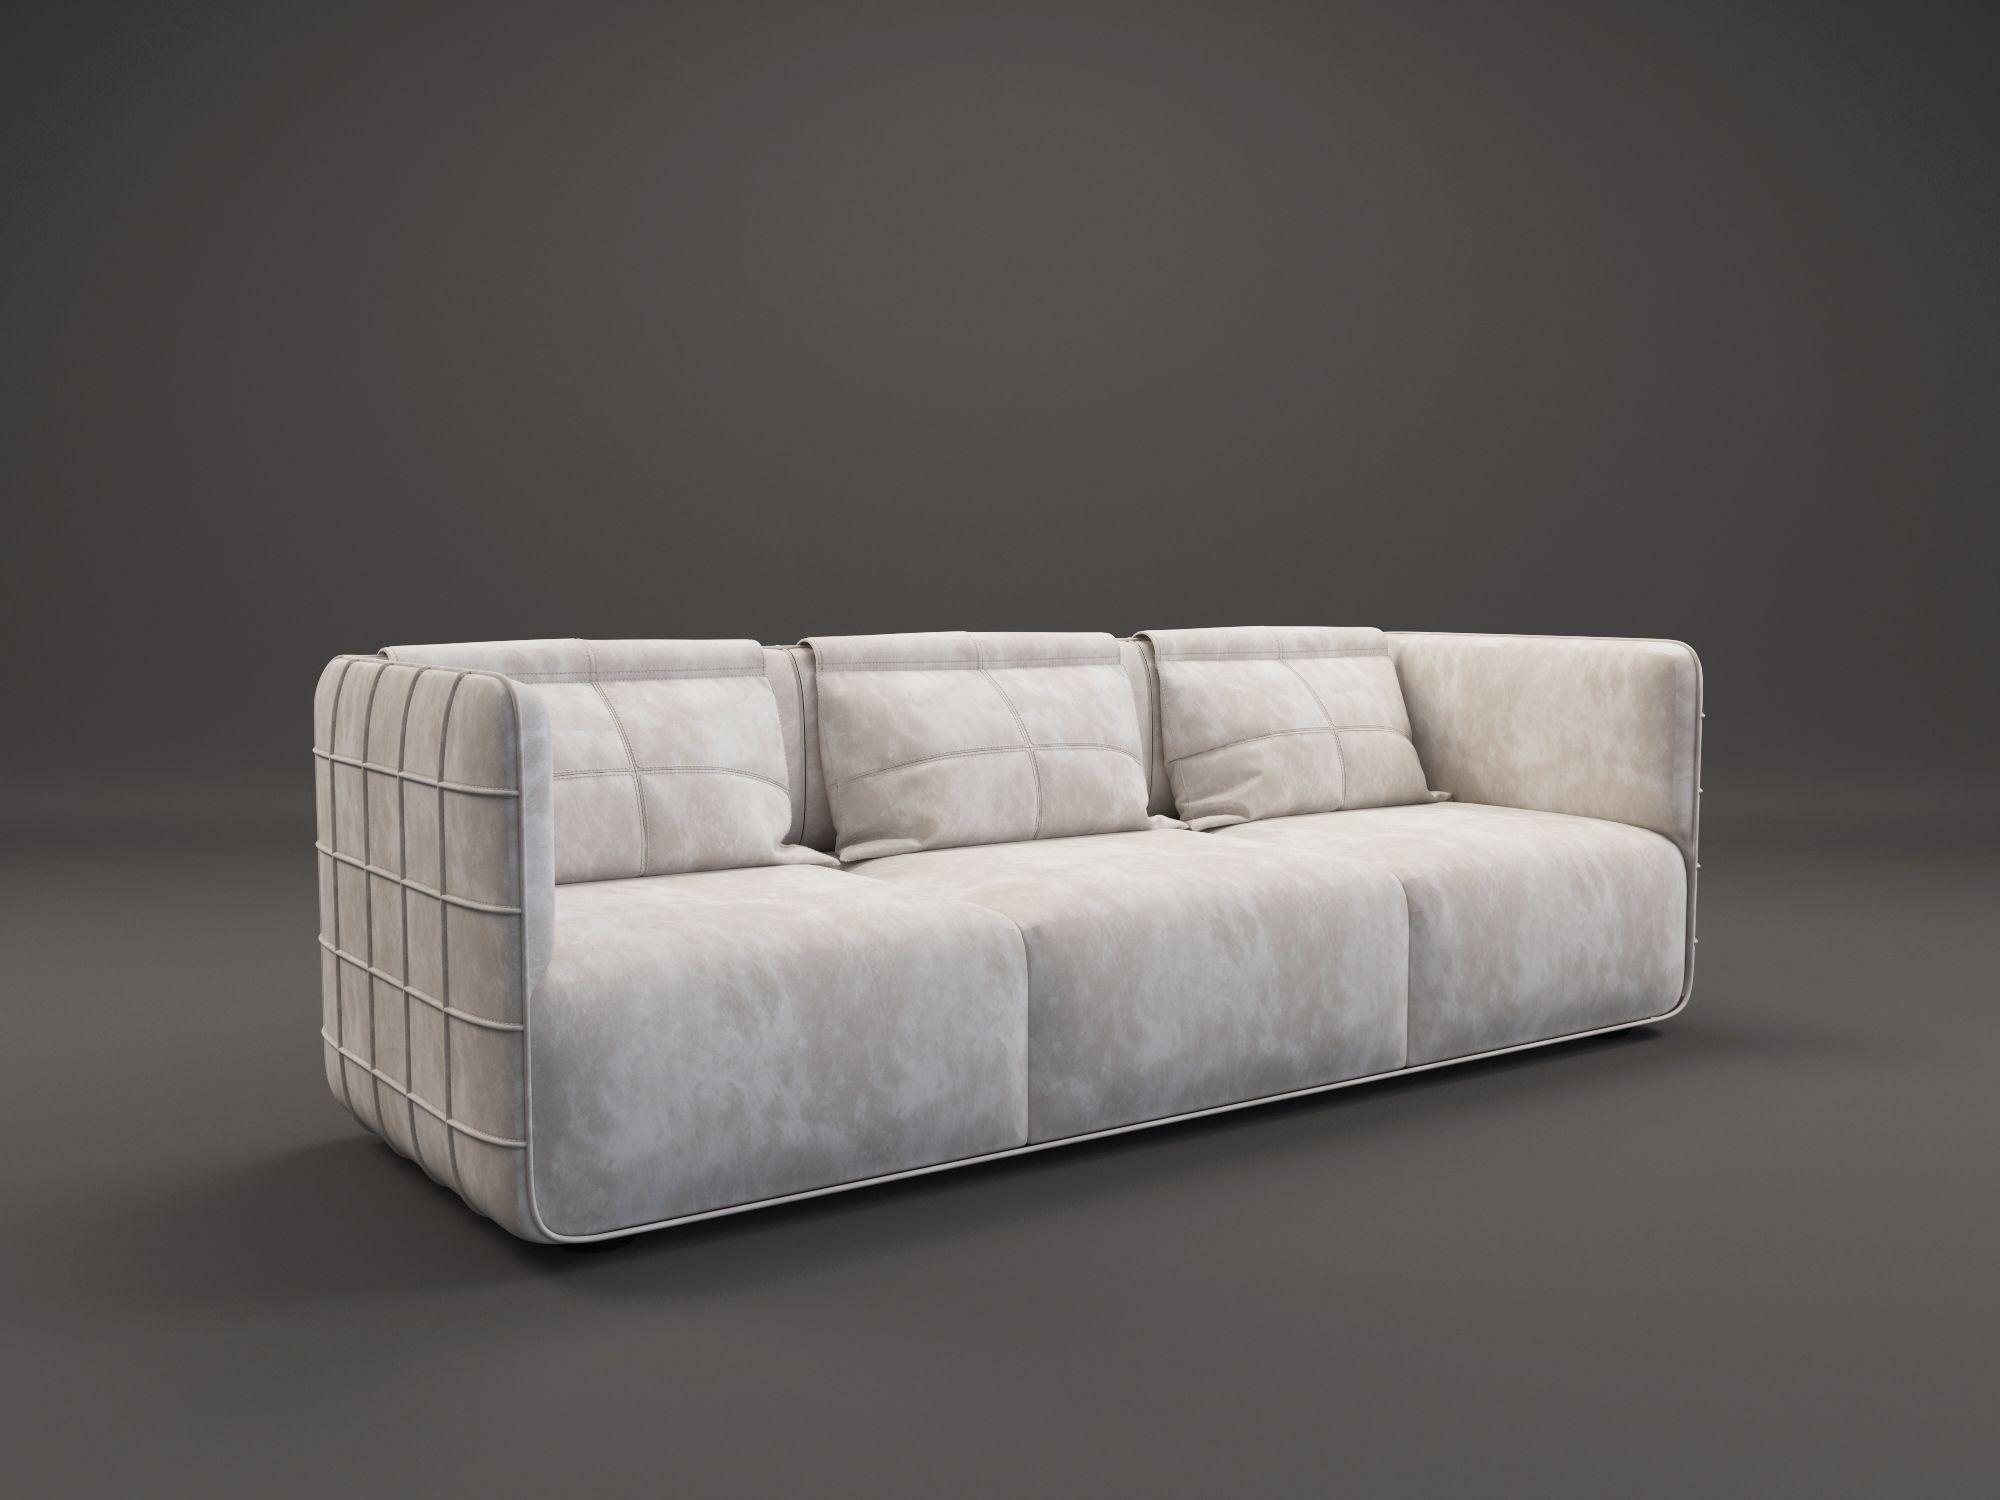 TORINO sofa by Ekaterina Elizarova. Nubuk, brass. #unique #design #furniture #ekaterinaelizarova #elizarova #limited #edition #madeinitaly #handcrafted #elizarovadesign #limitededition #art #modernart #collection